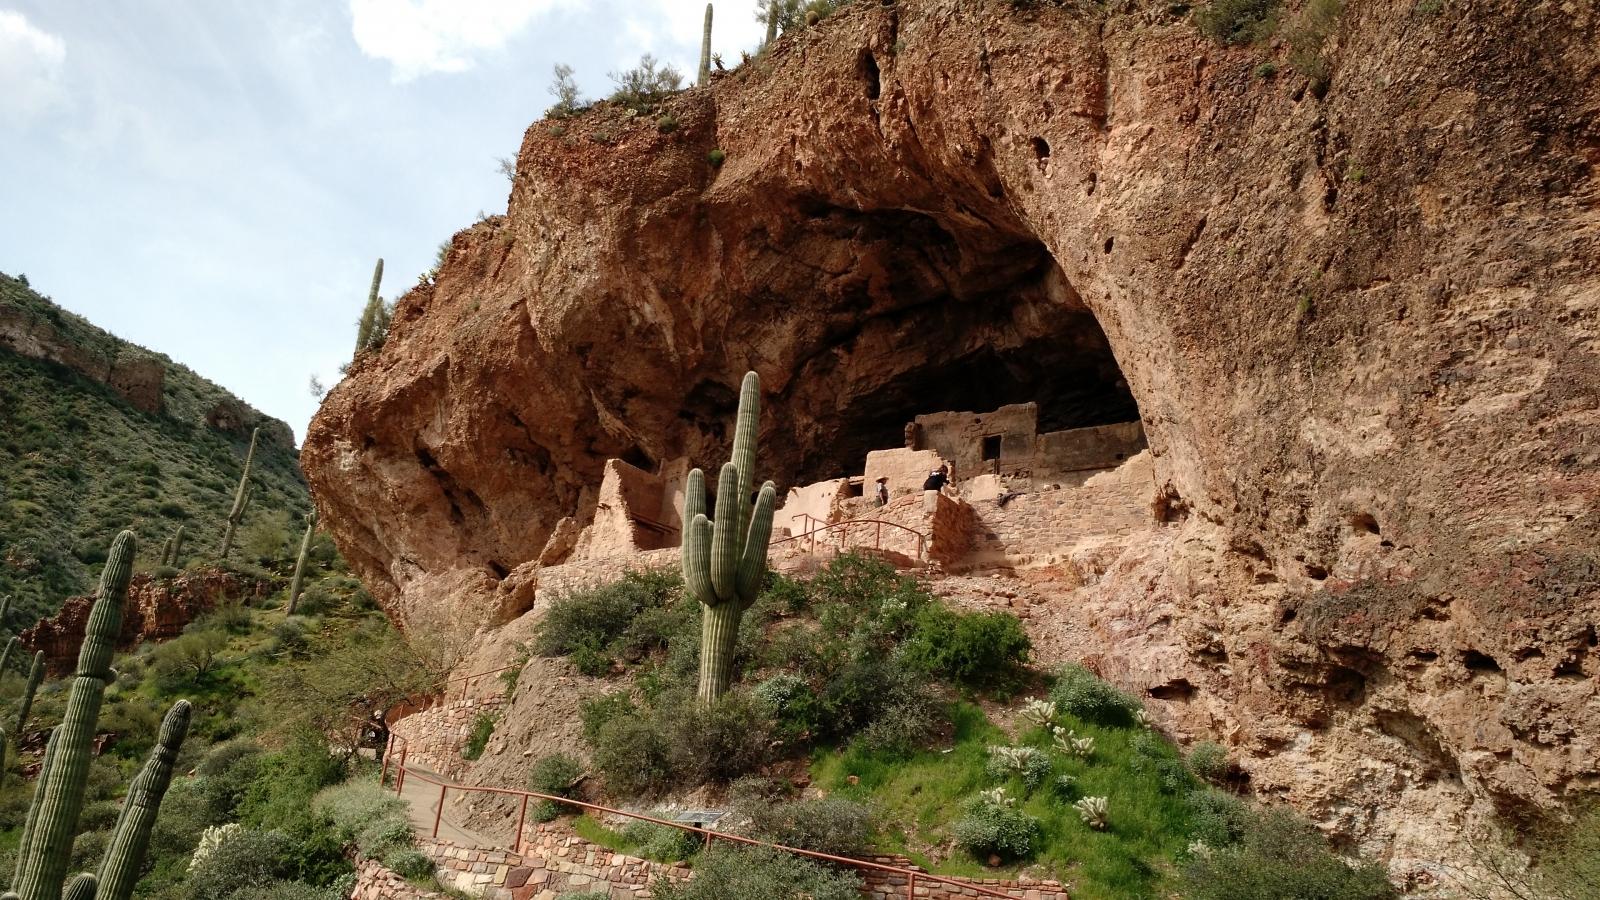 Tonto Basin Cliff Dwelling